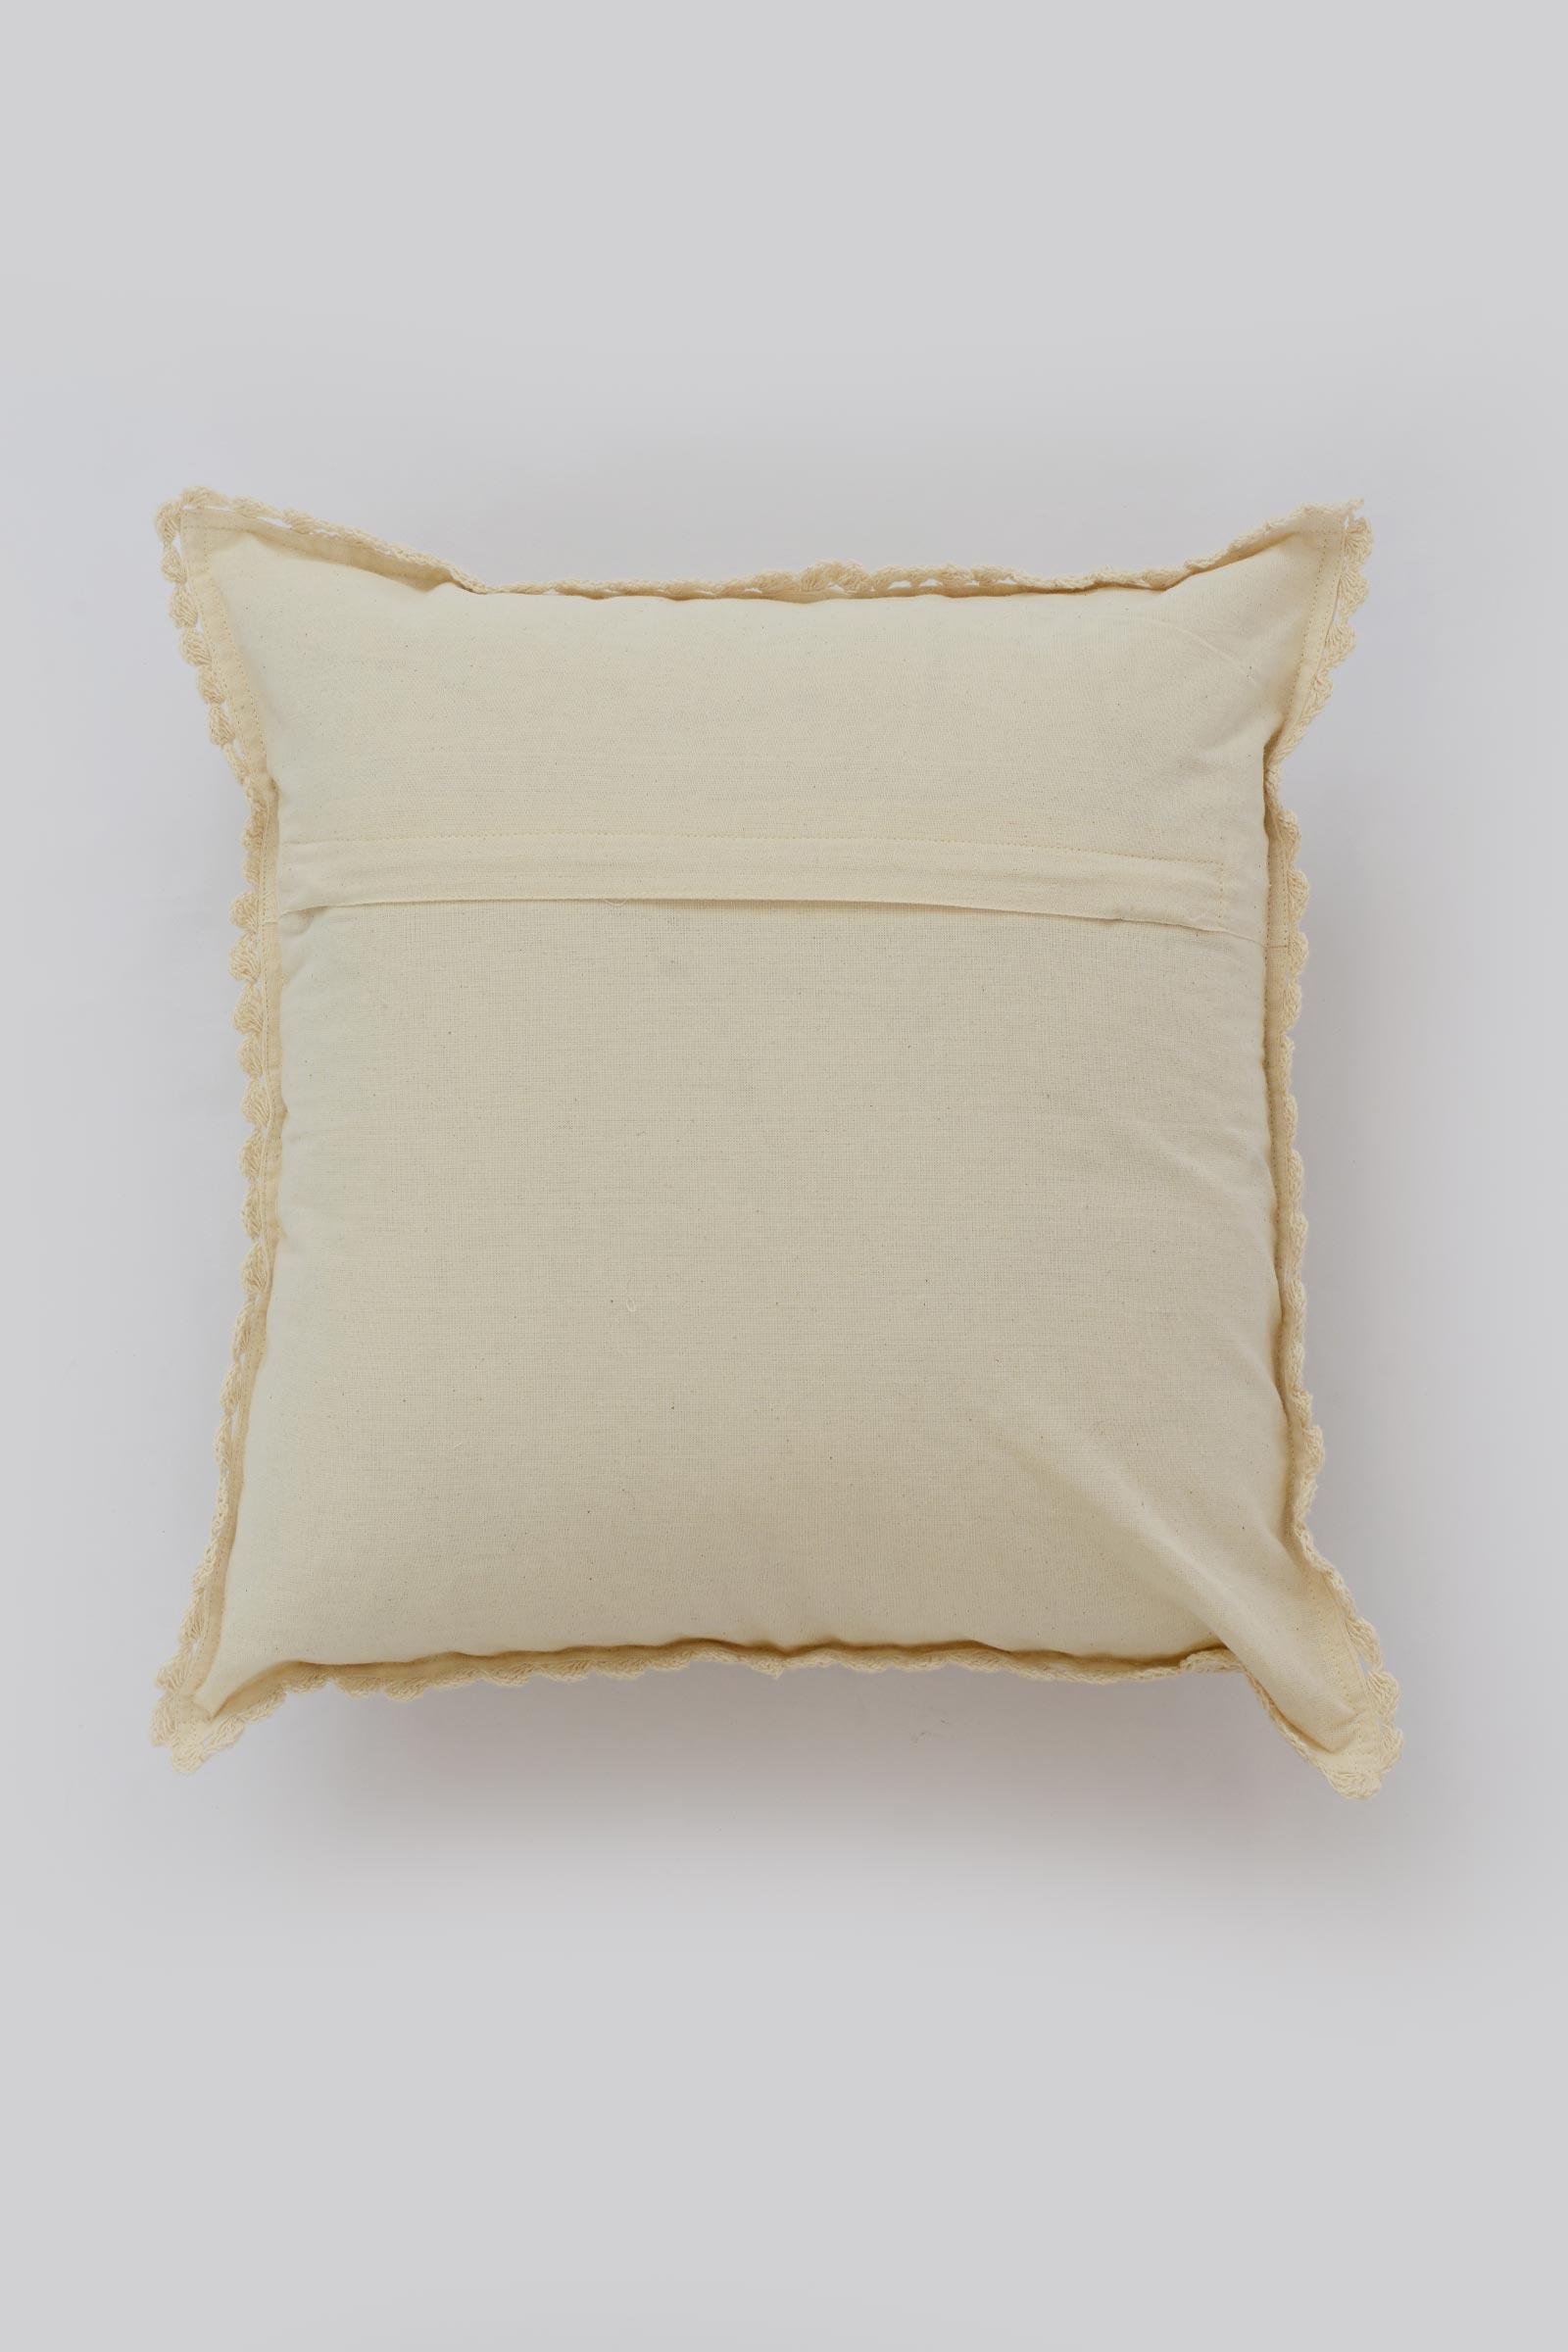 Crochet Border Cushion Cover